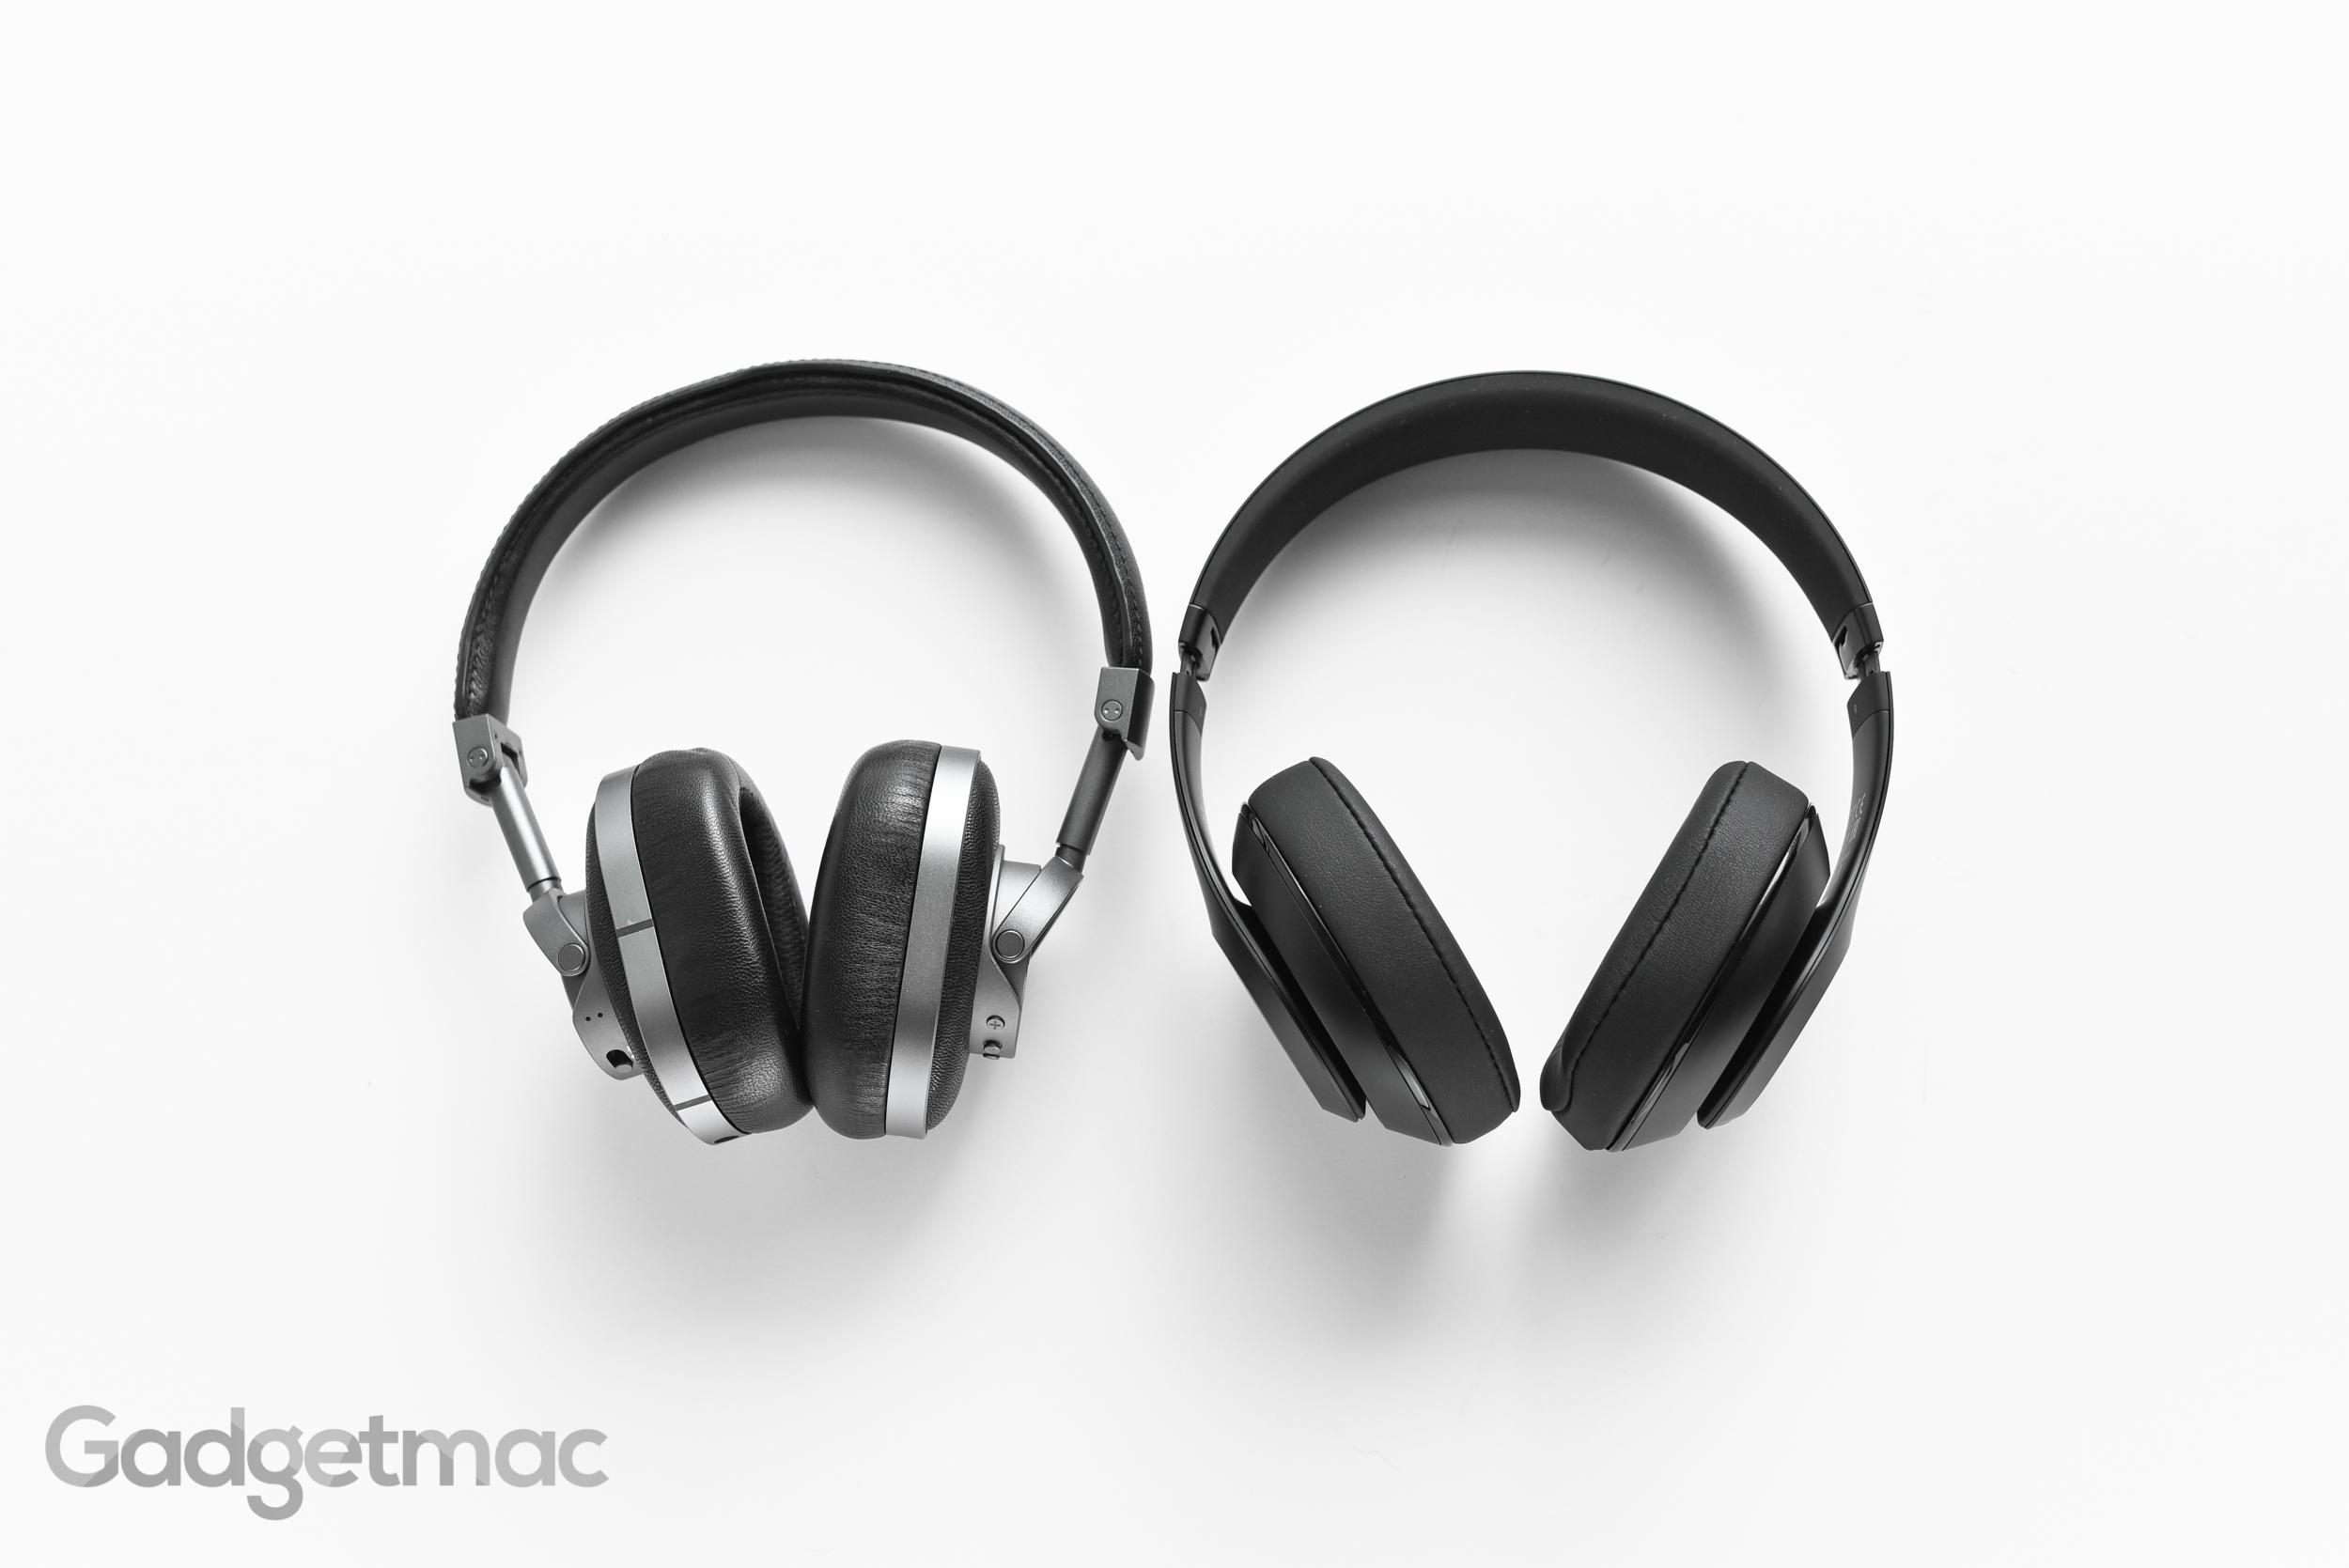 master-dynamic-mw60-vs-beats-studio-wireless-headphones-comparison.jpg